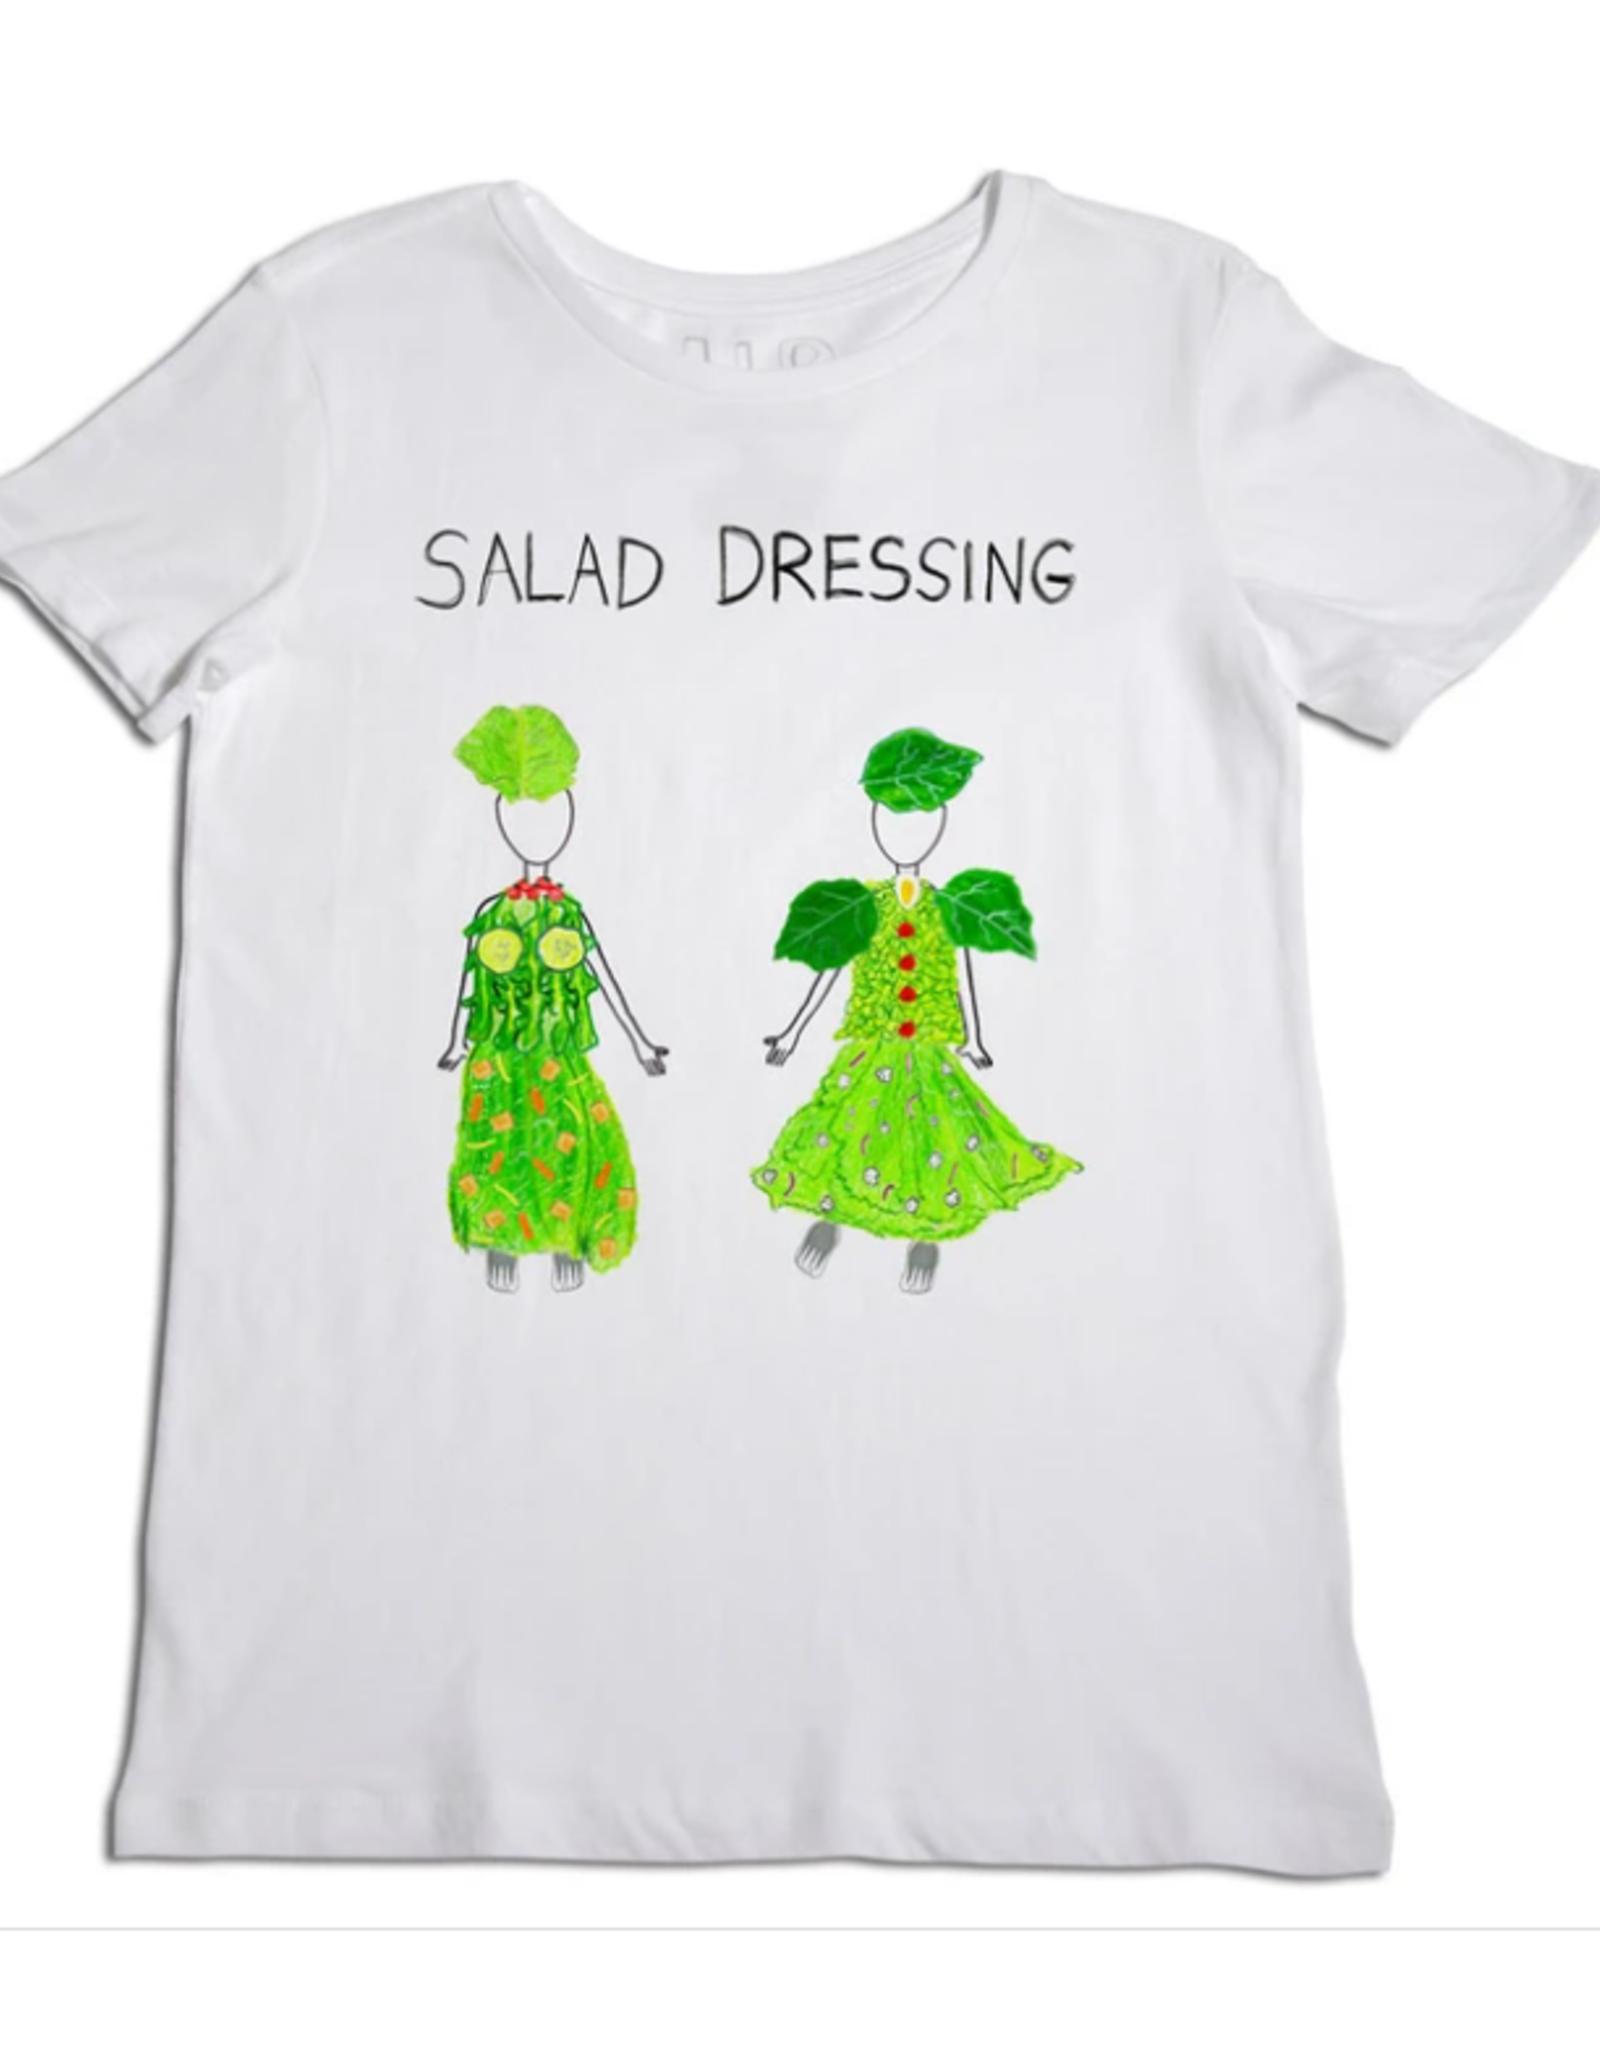 UNFORTUNATE PORTRAIT - Salad Dressing Tee